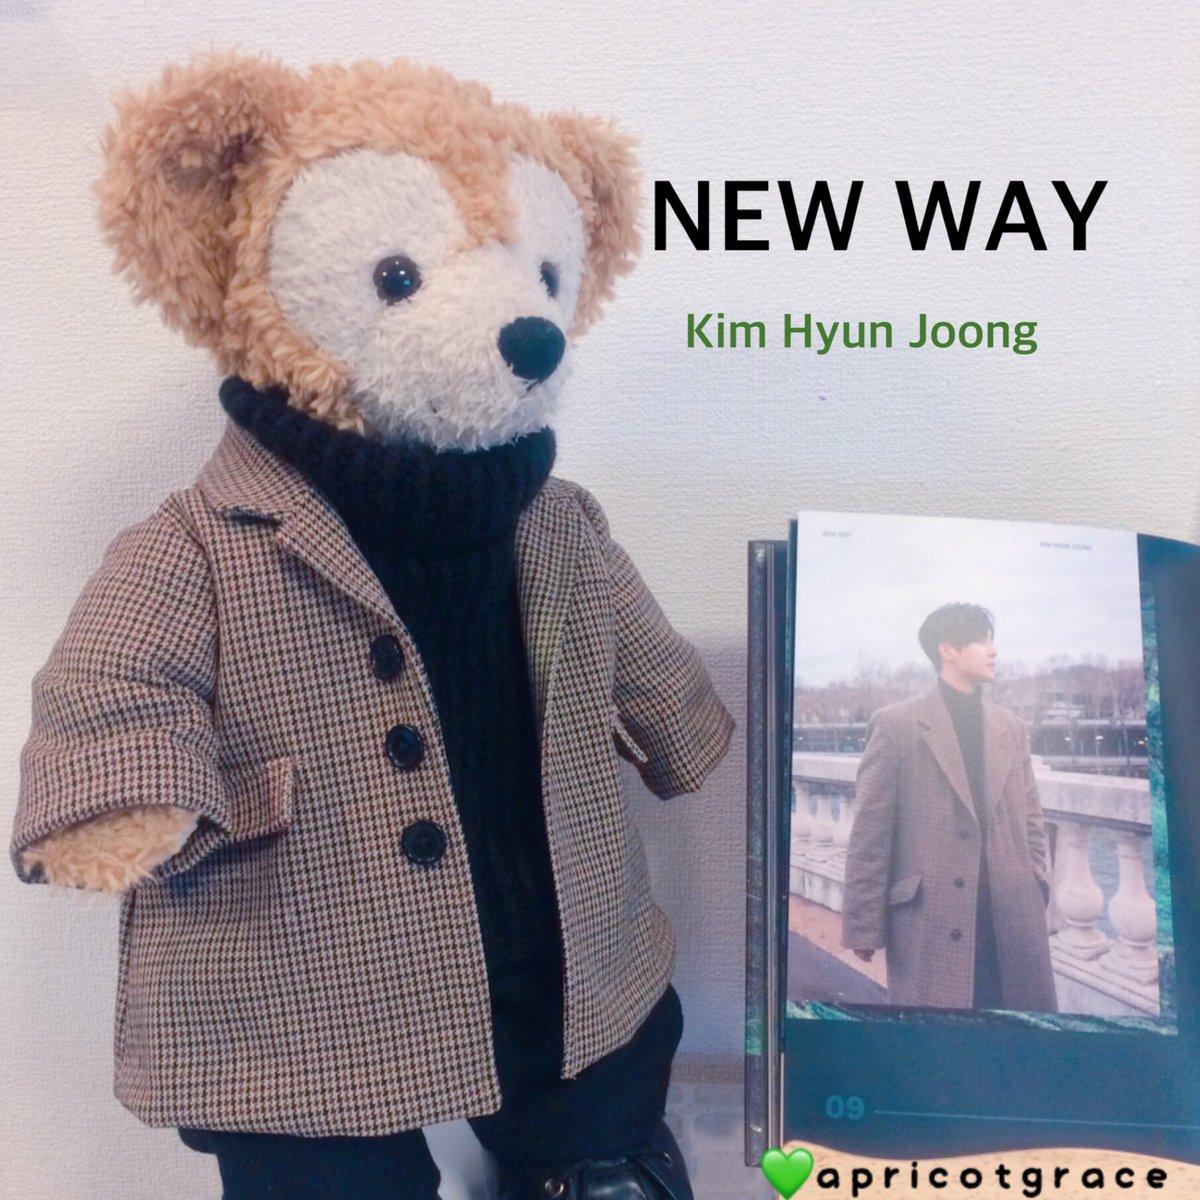 Kim Hyun Joong NEWWAY concert  in Busan 2/23(sat) たくさんたくさん参加してね❣️ #김현중 #kimhyungjoong #キムヒョンジュン #金賢重 #NEWWAY  #リダ #リダッフィ